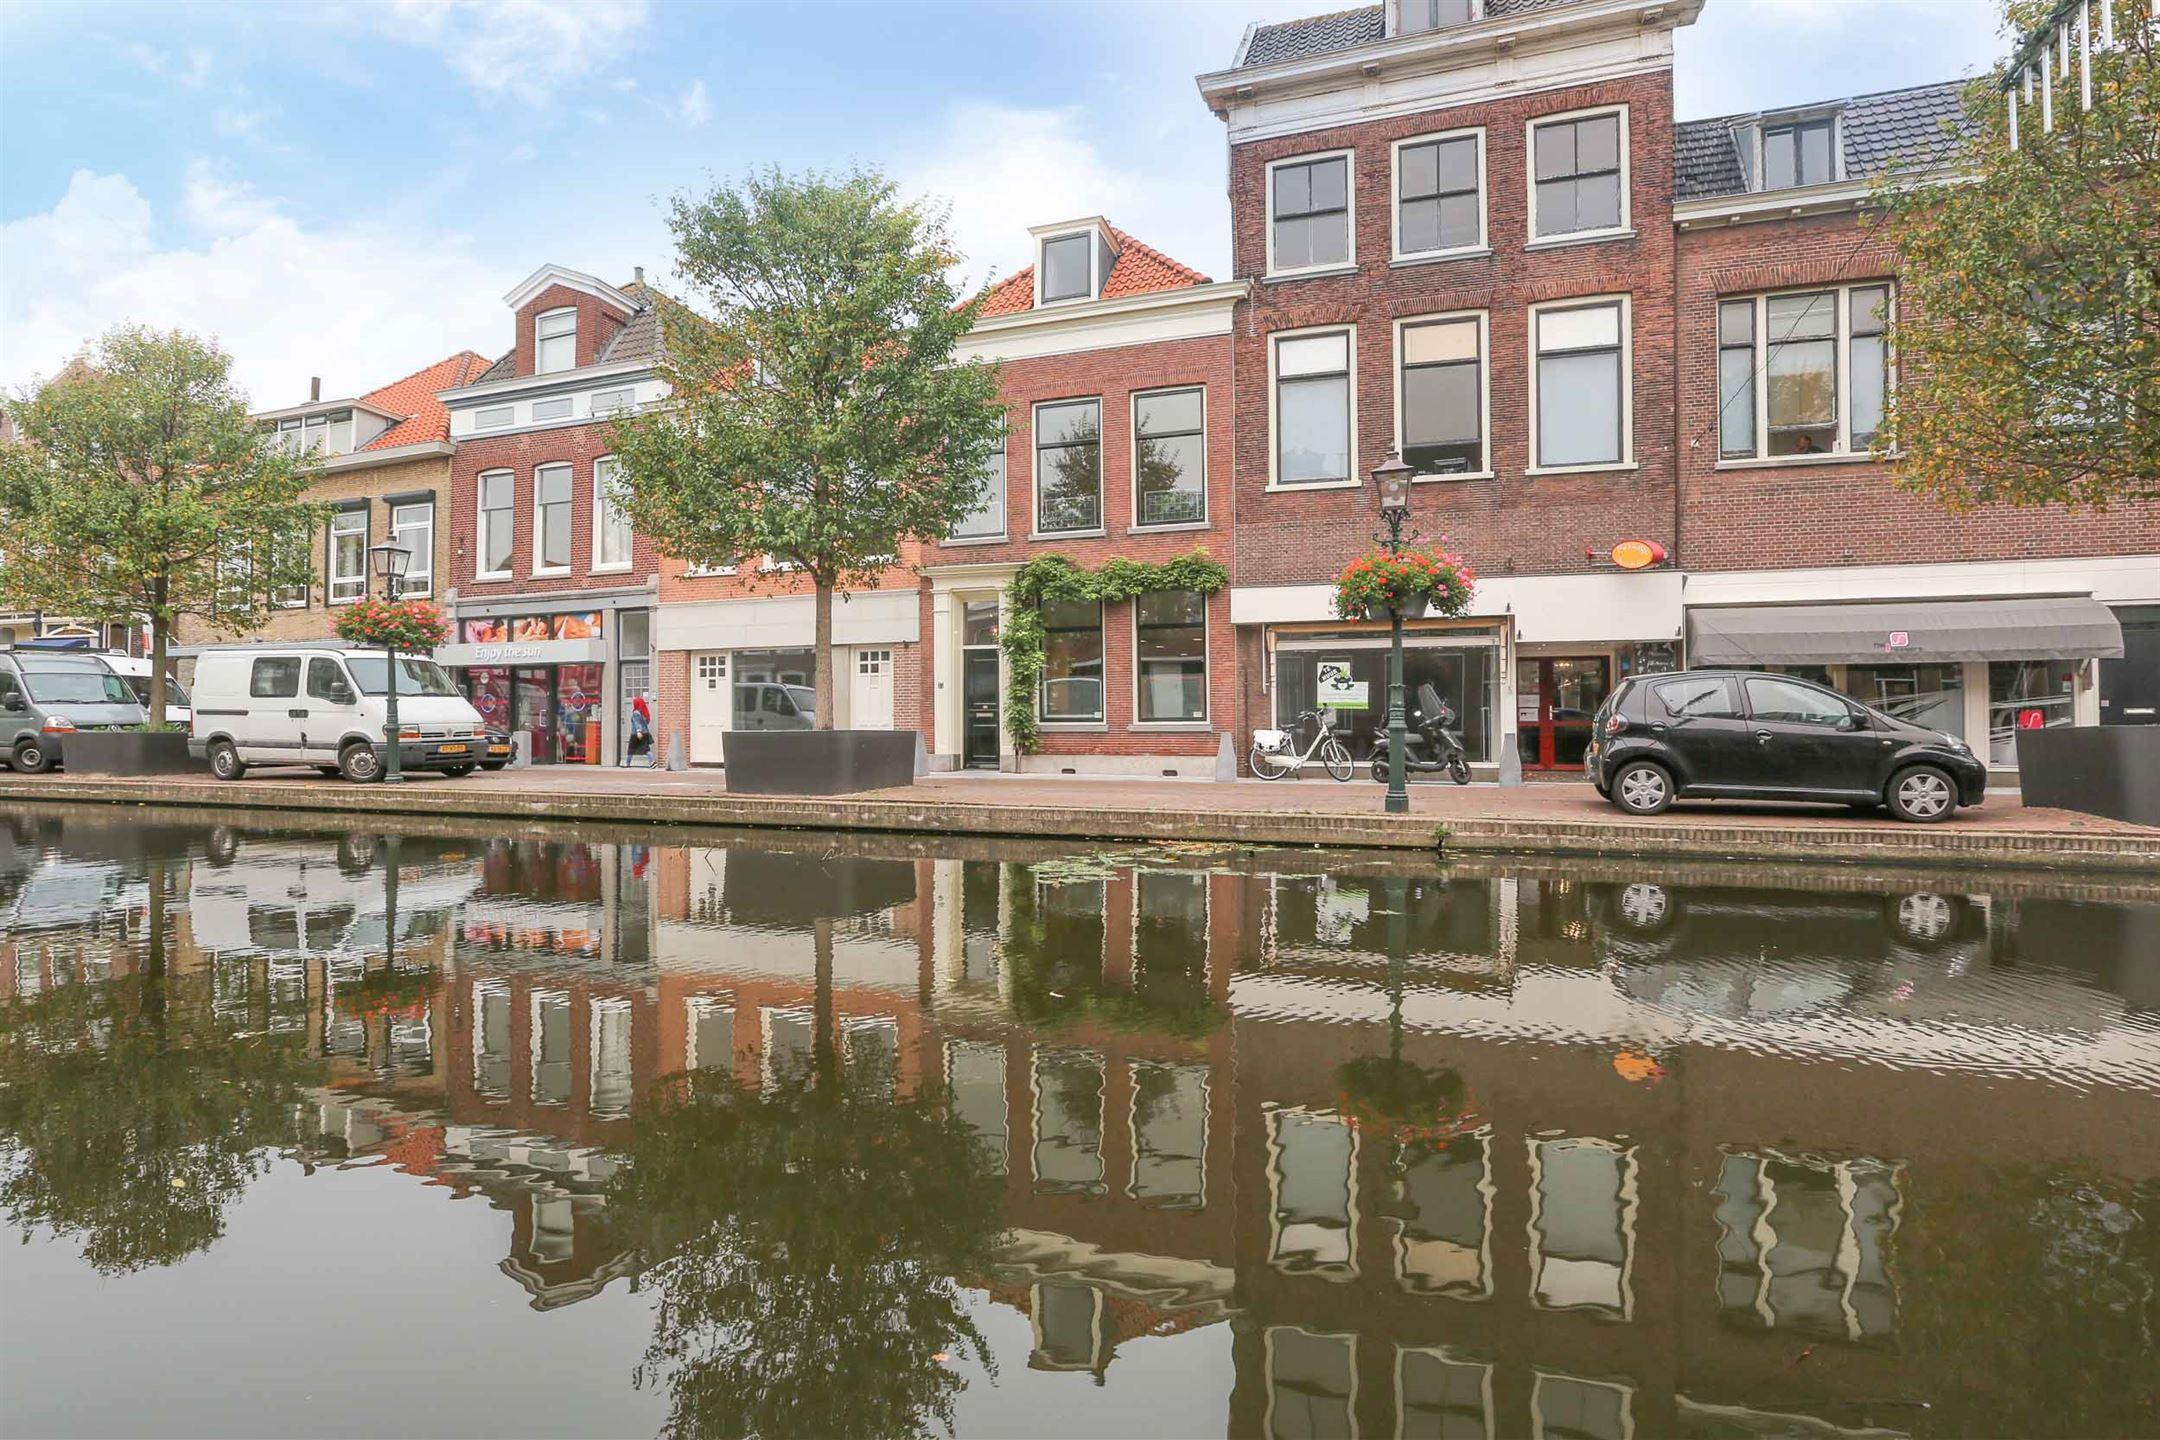 Multi Keukens Maassluis : Verkocht noordvliet cj maassluis funda